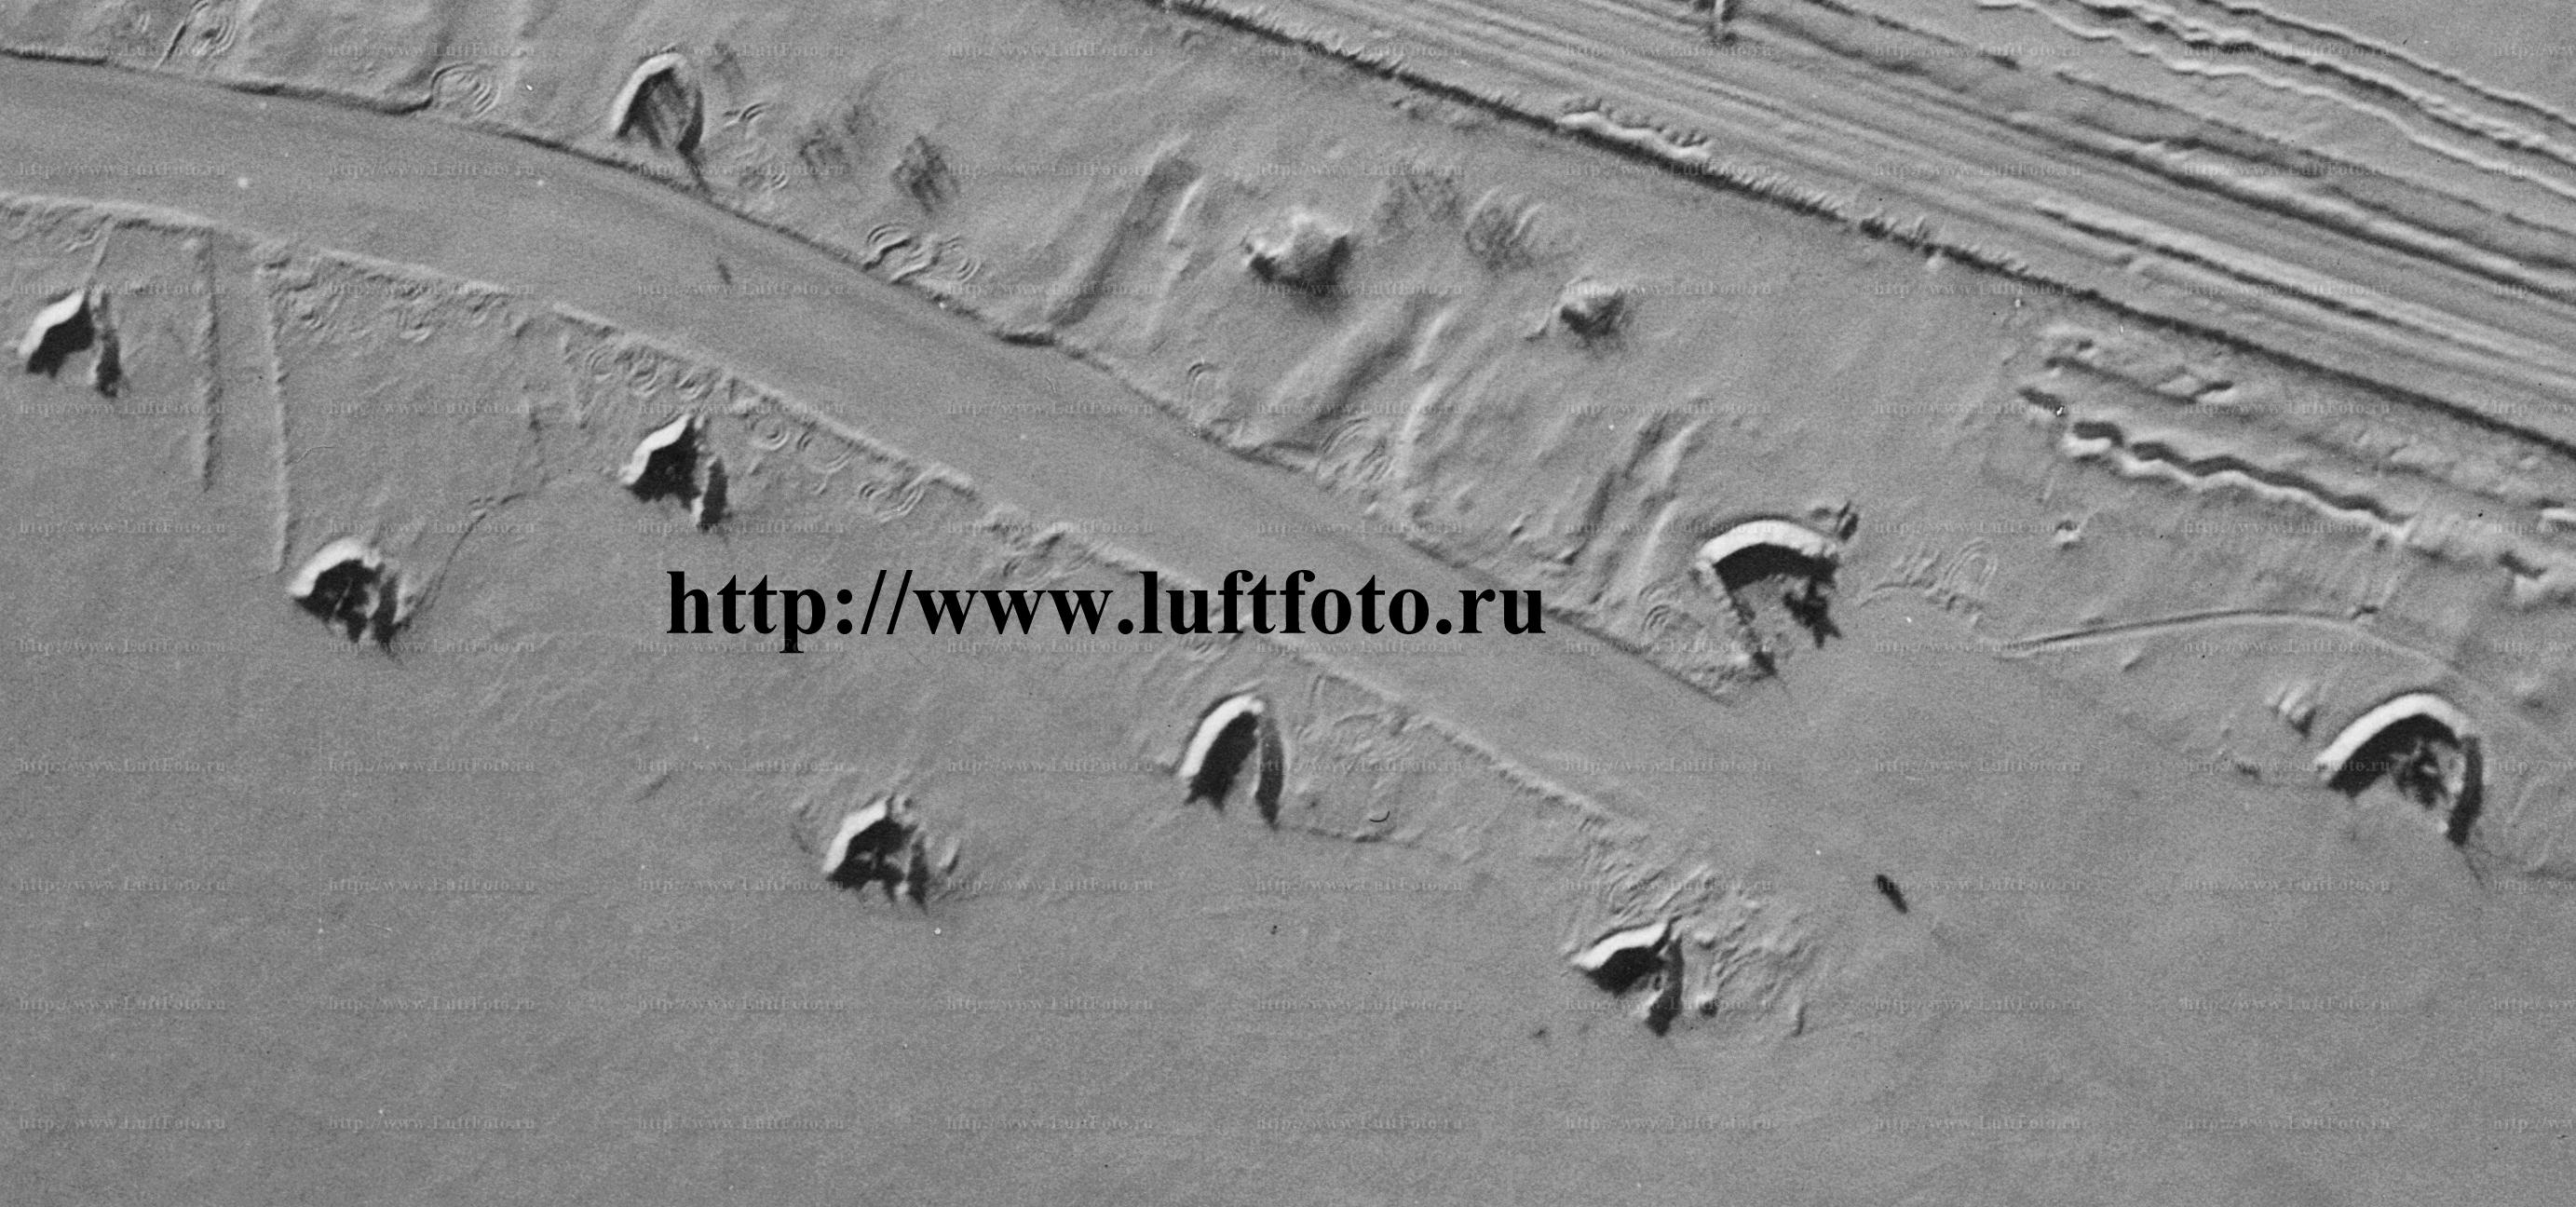 Аэрофотосъемка Люфтваффе: http://www.luftfoto.ru/primeri.html